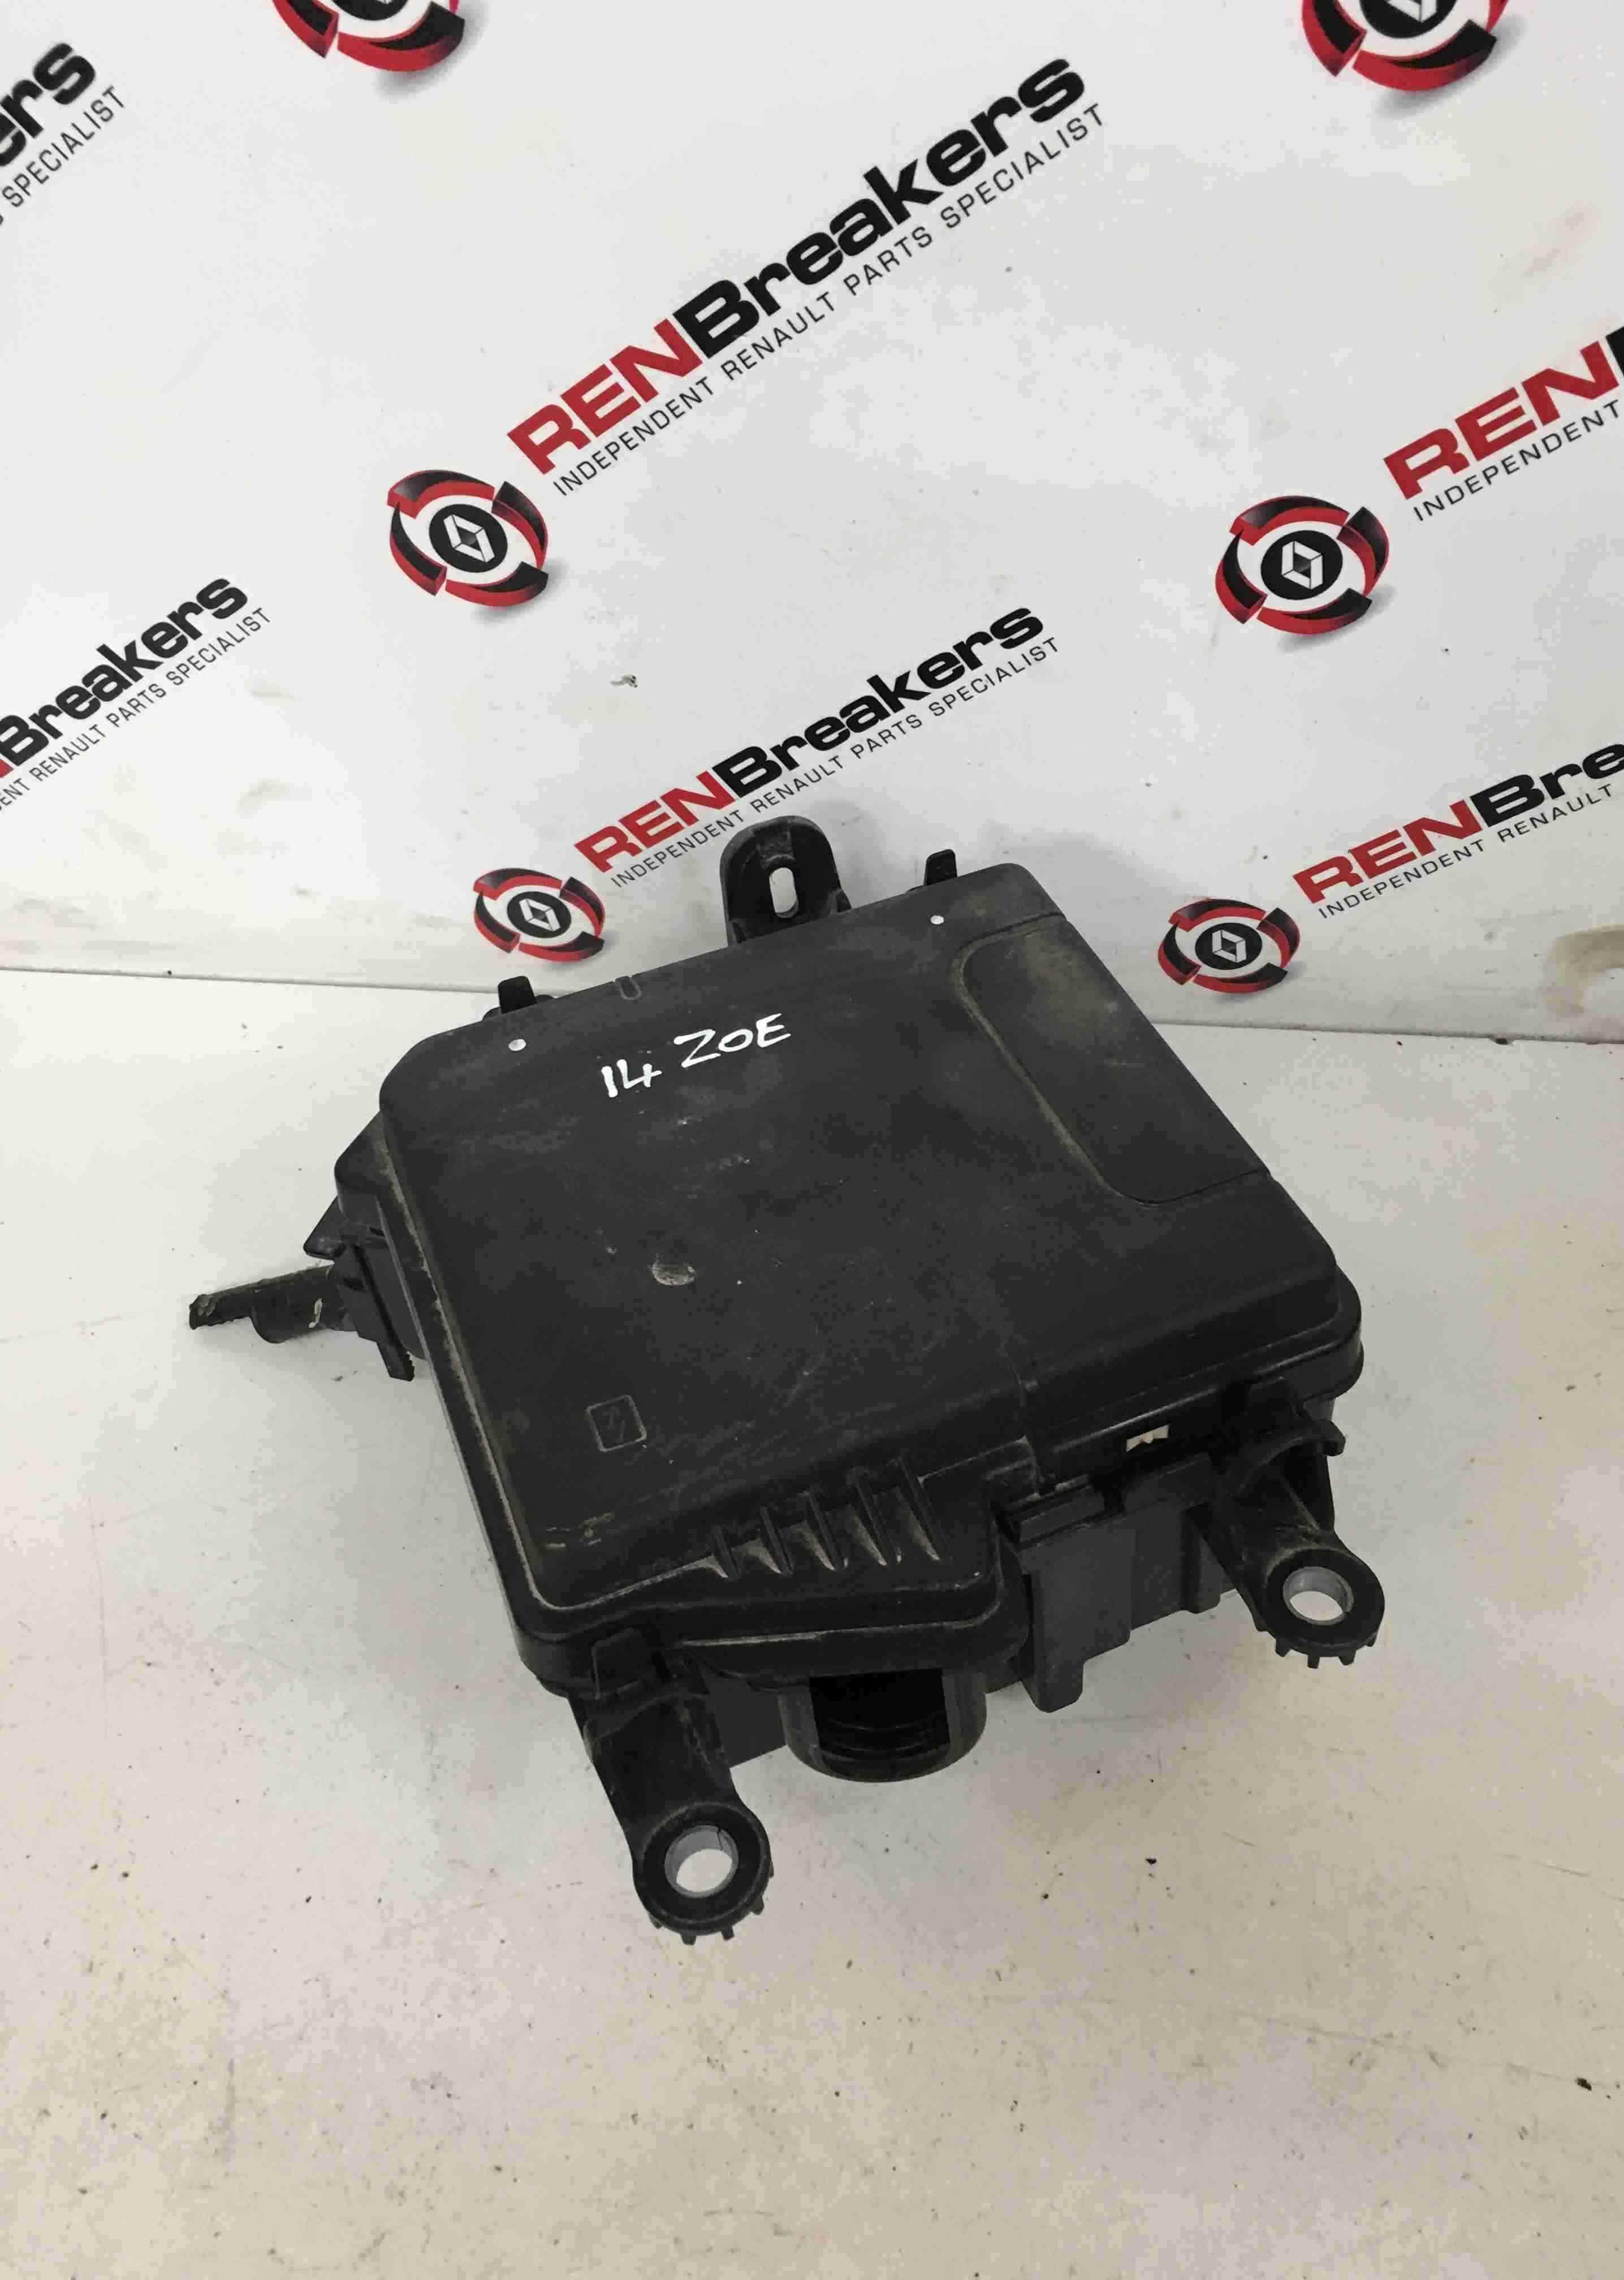 Renault Zoe 2012-2016 Engine Fuse Box Plastic Cover Tray Holder 284B03998R